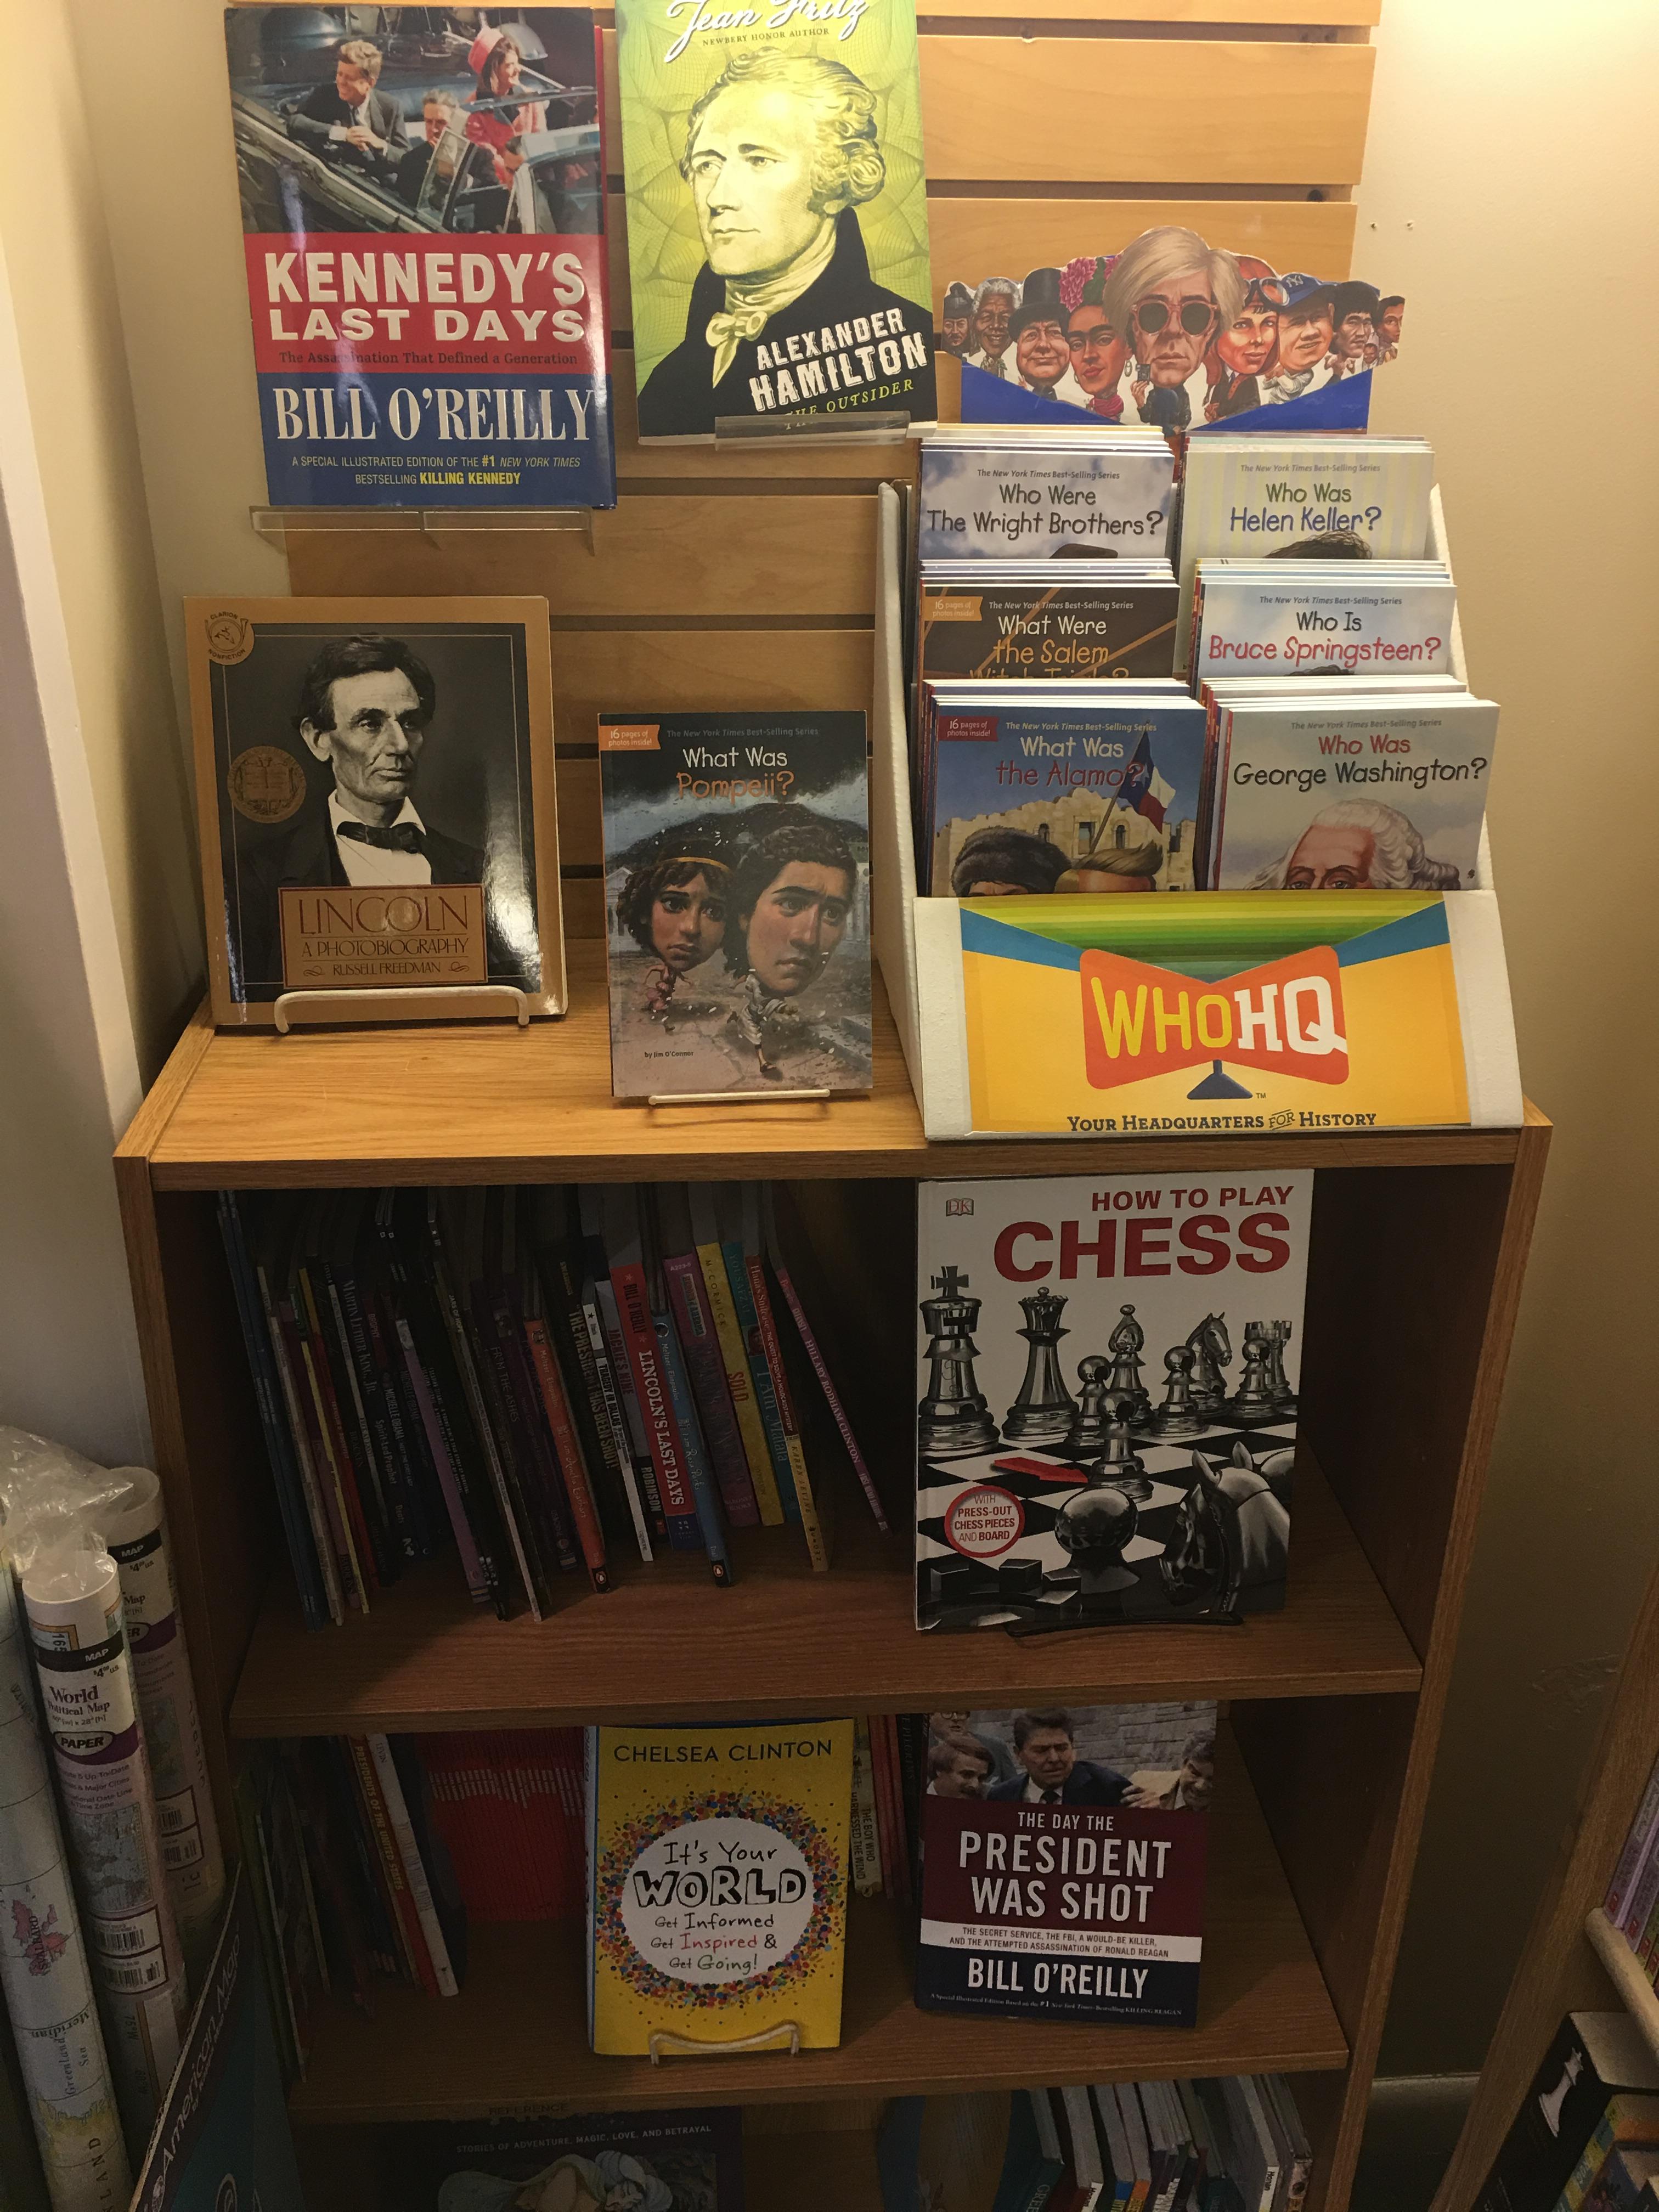 Children's nonfiction books